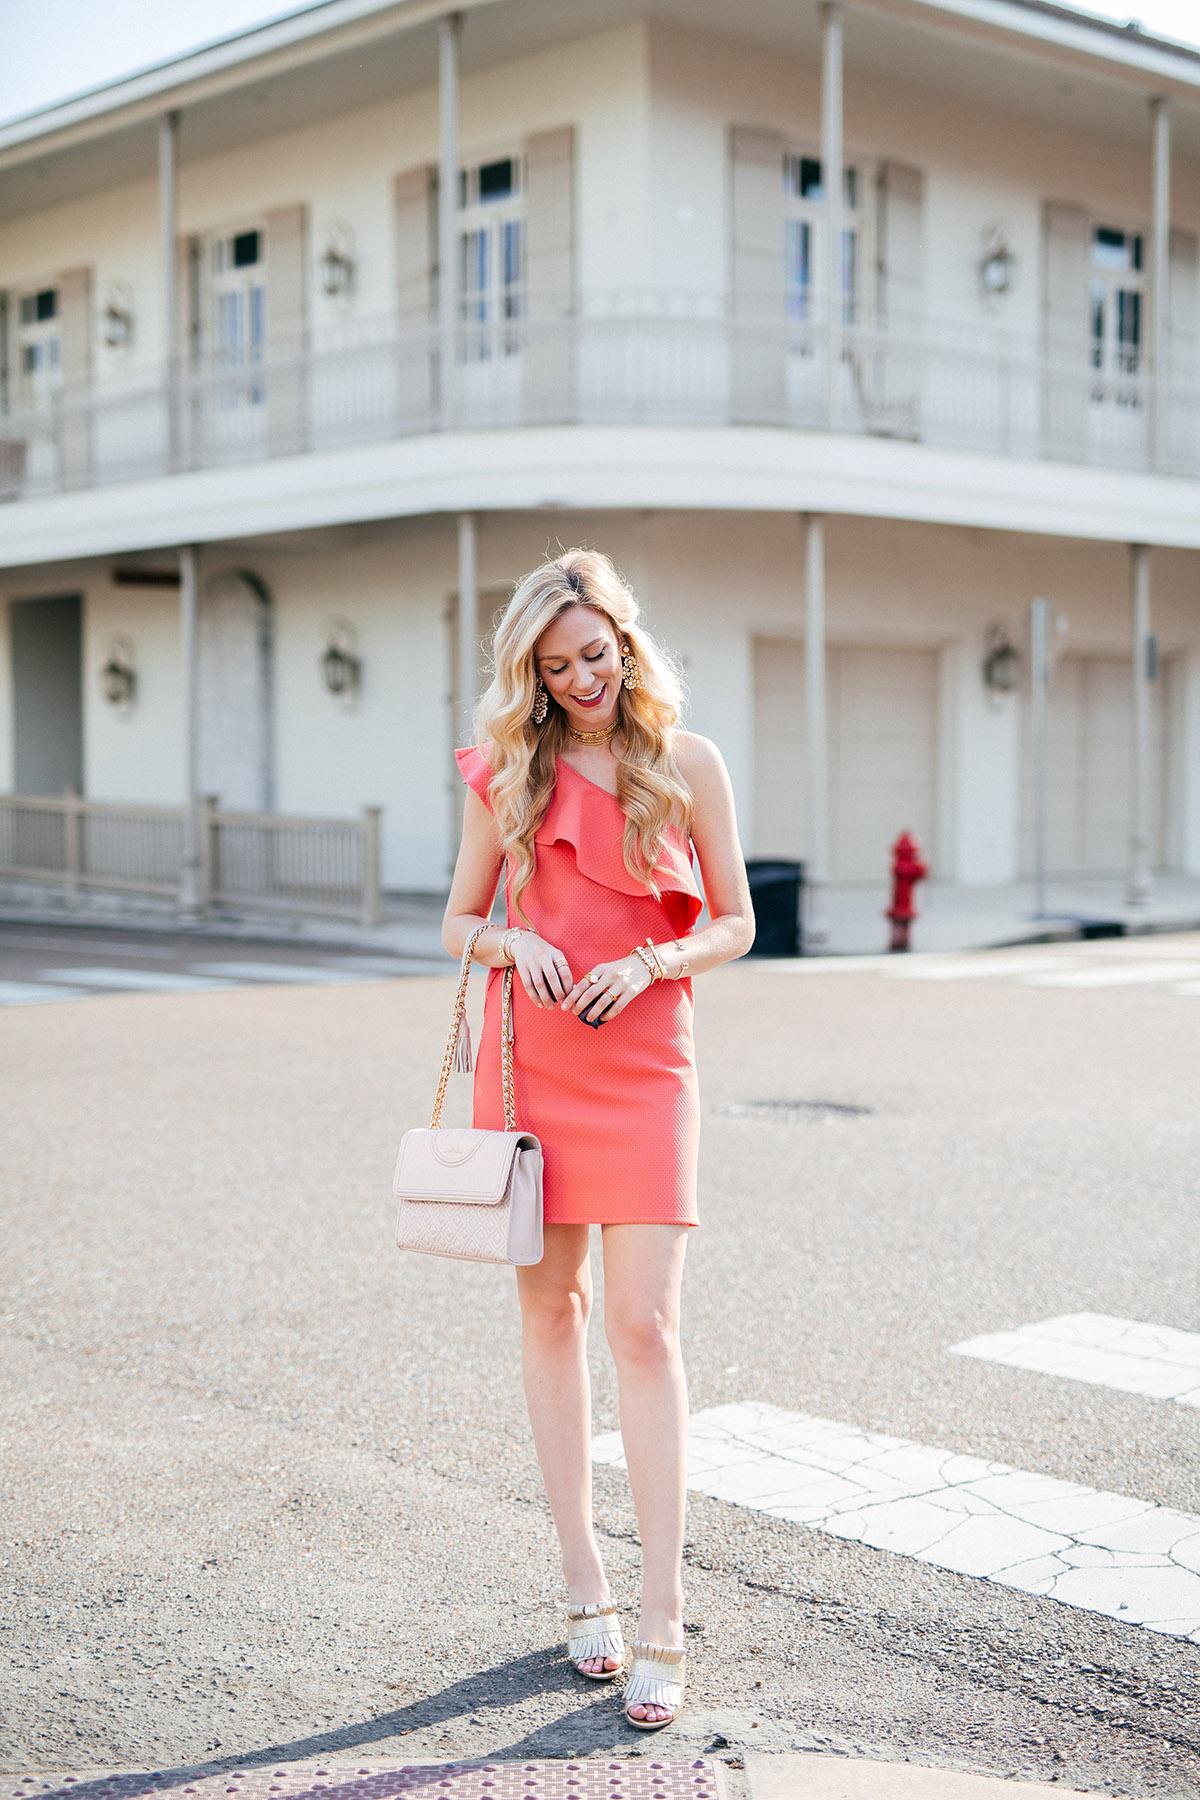 Easter Dress Options For All Budgets   Coral One-Shoulder Dress